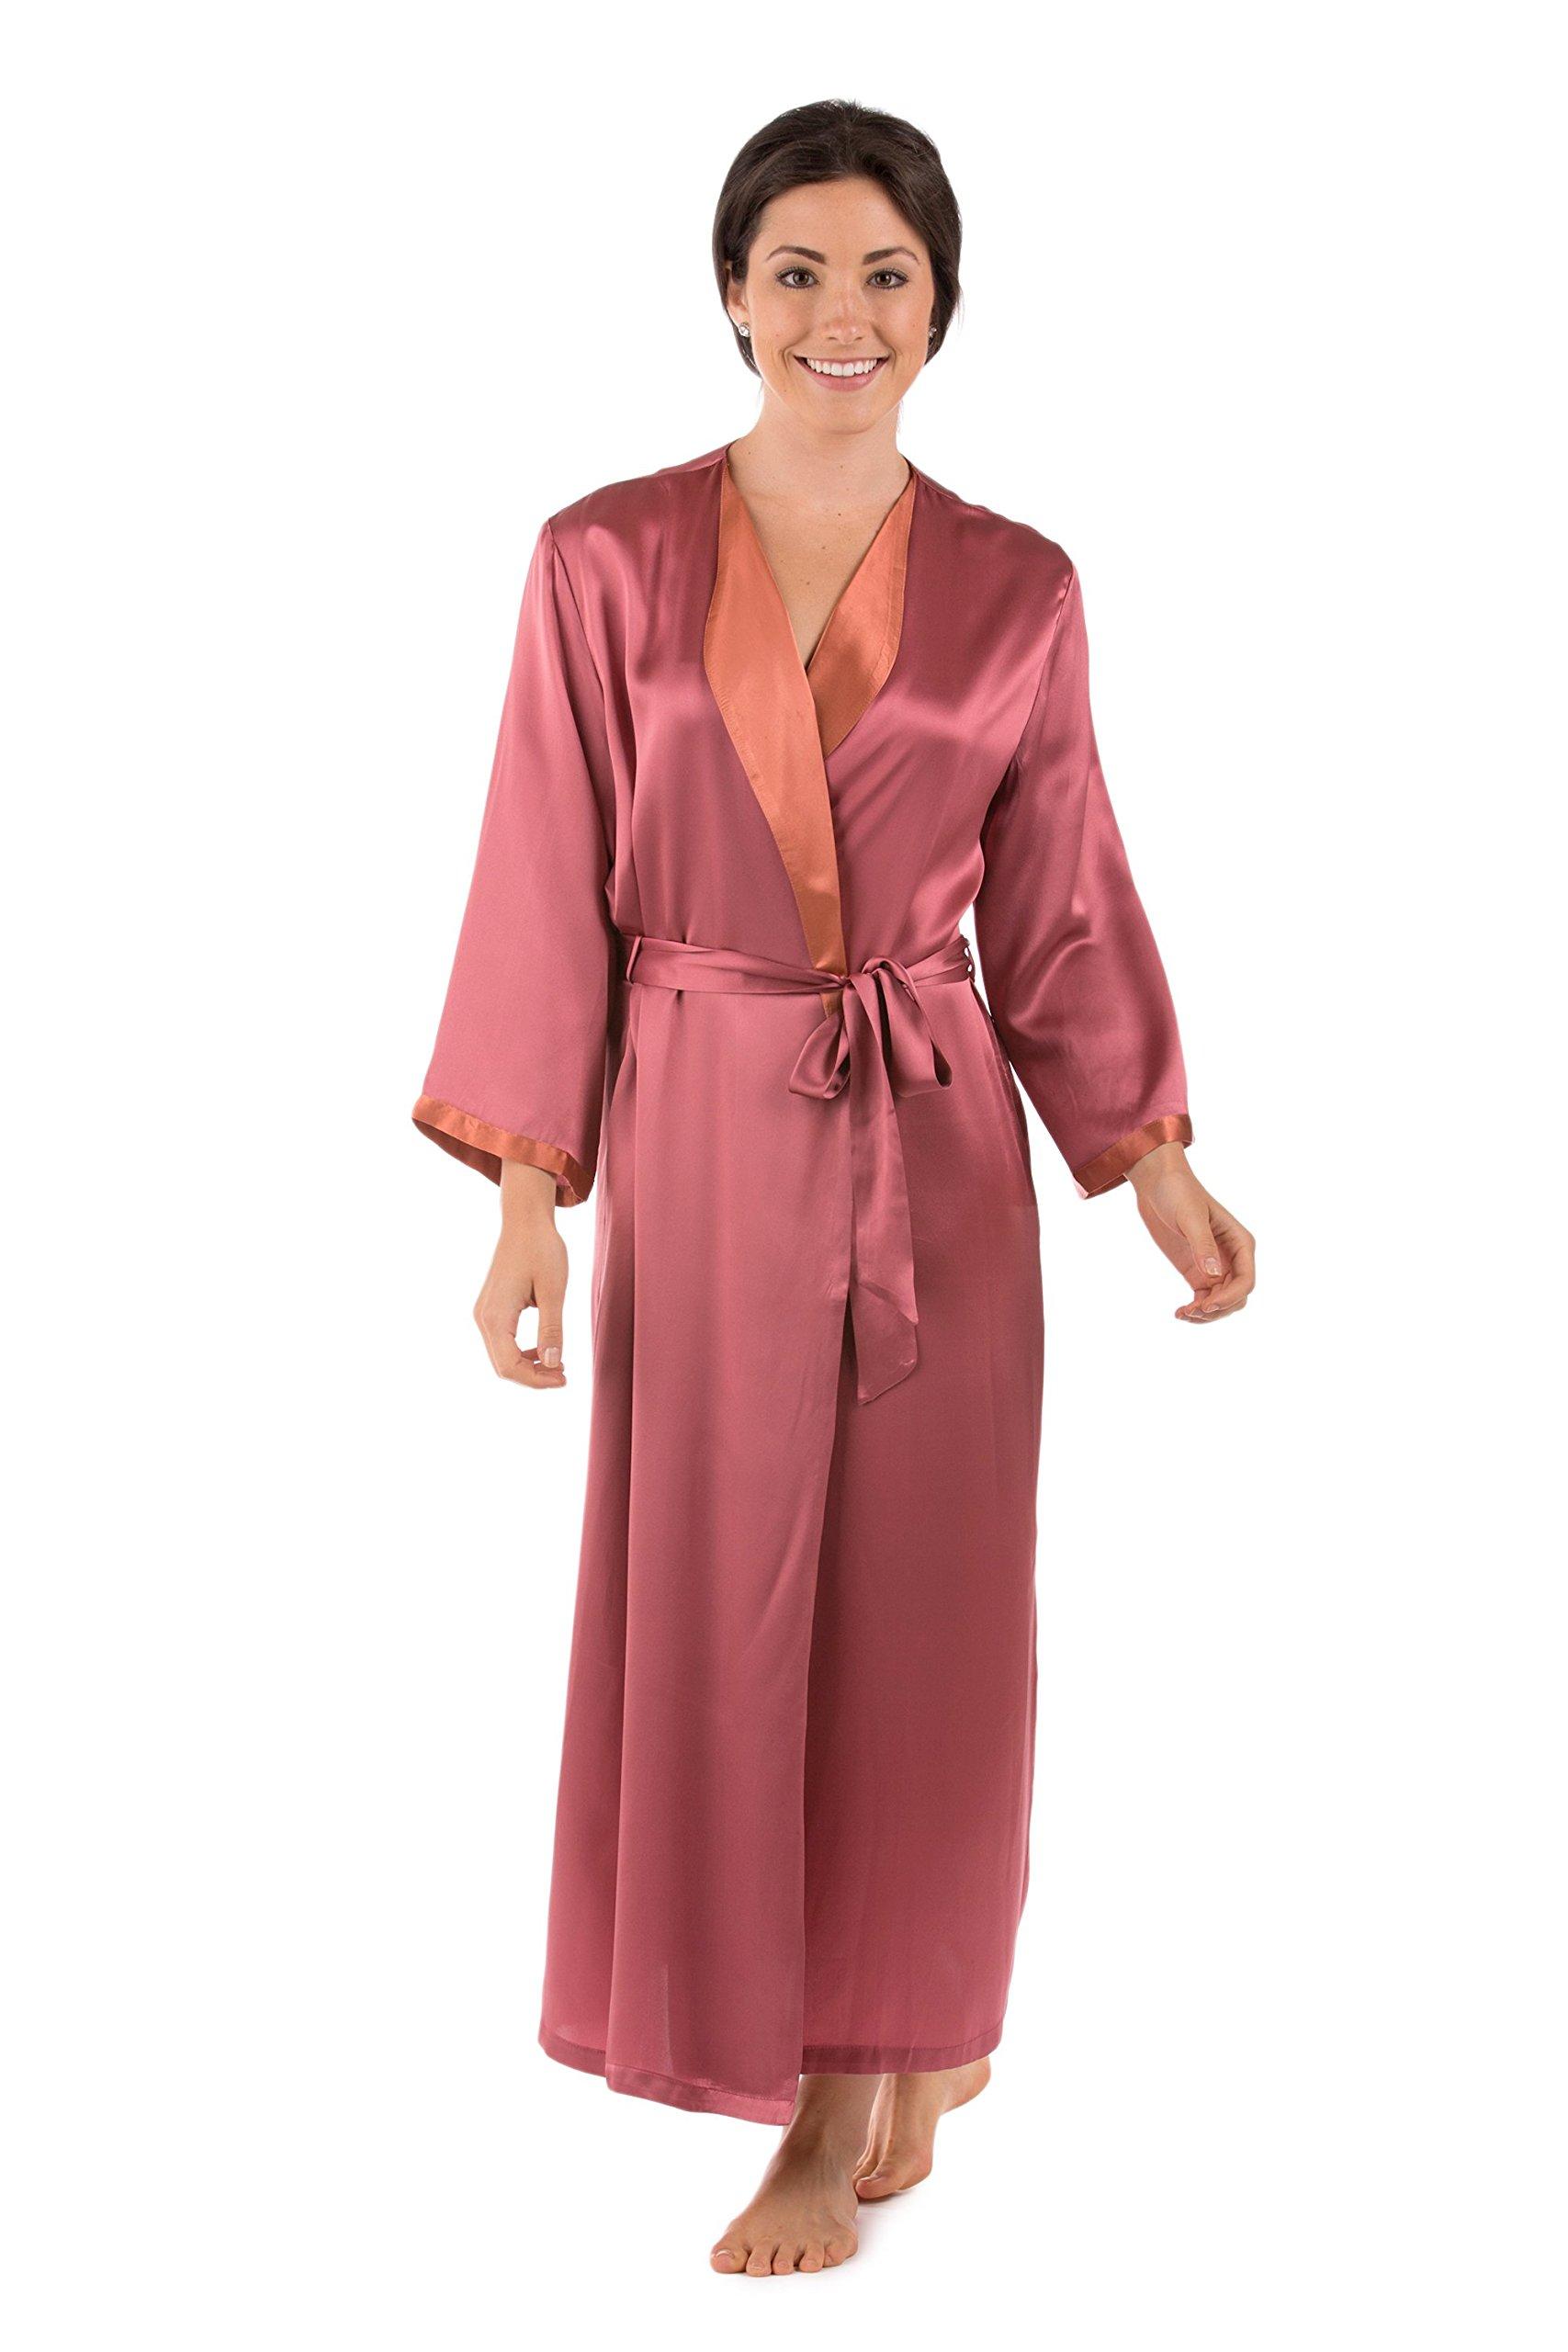 Texeresilk Women S Luxury Long Silk Bathrobe Sleepwear Robe Beautibliss